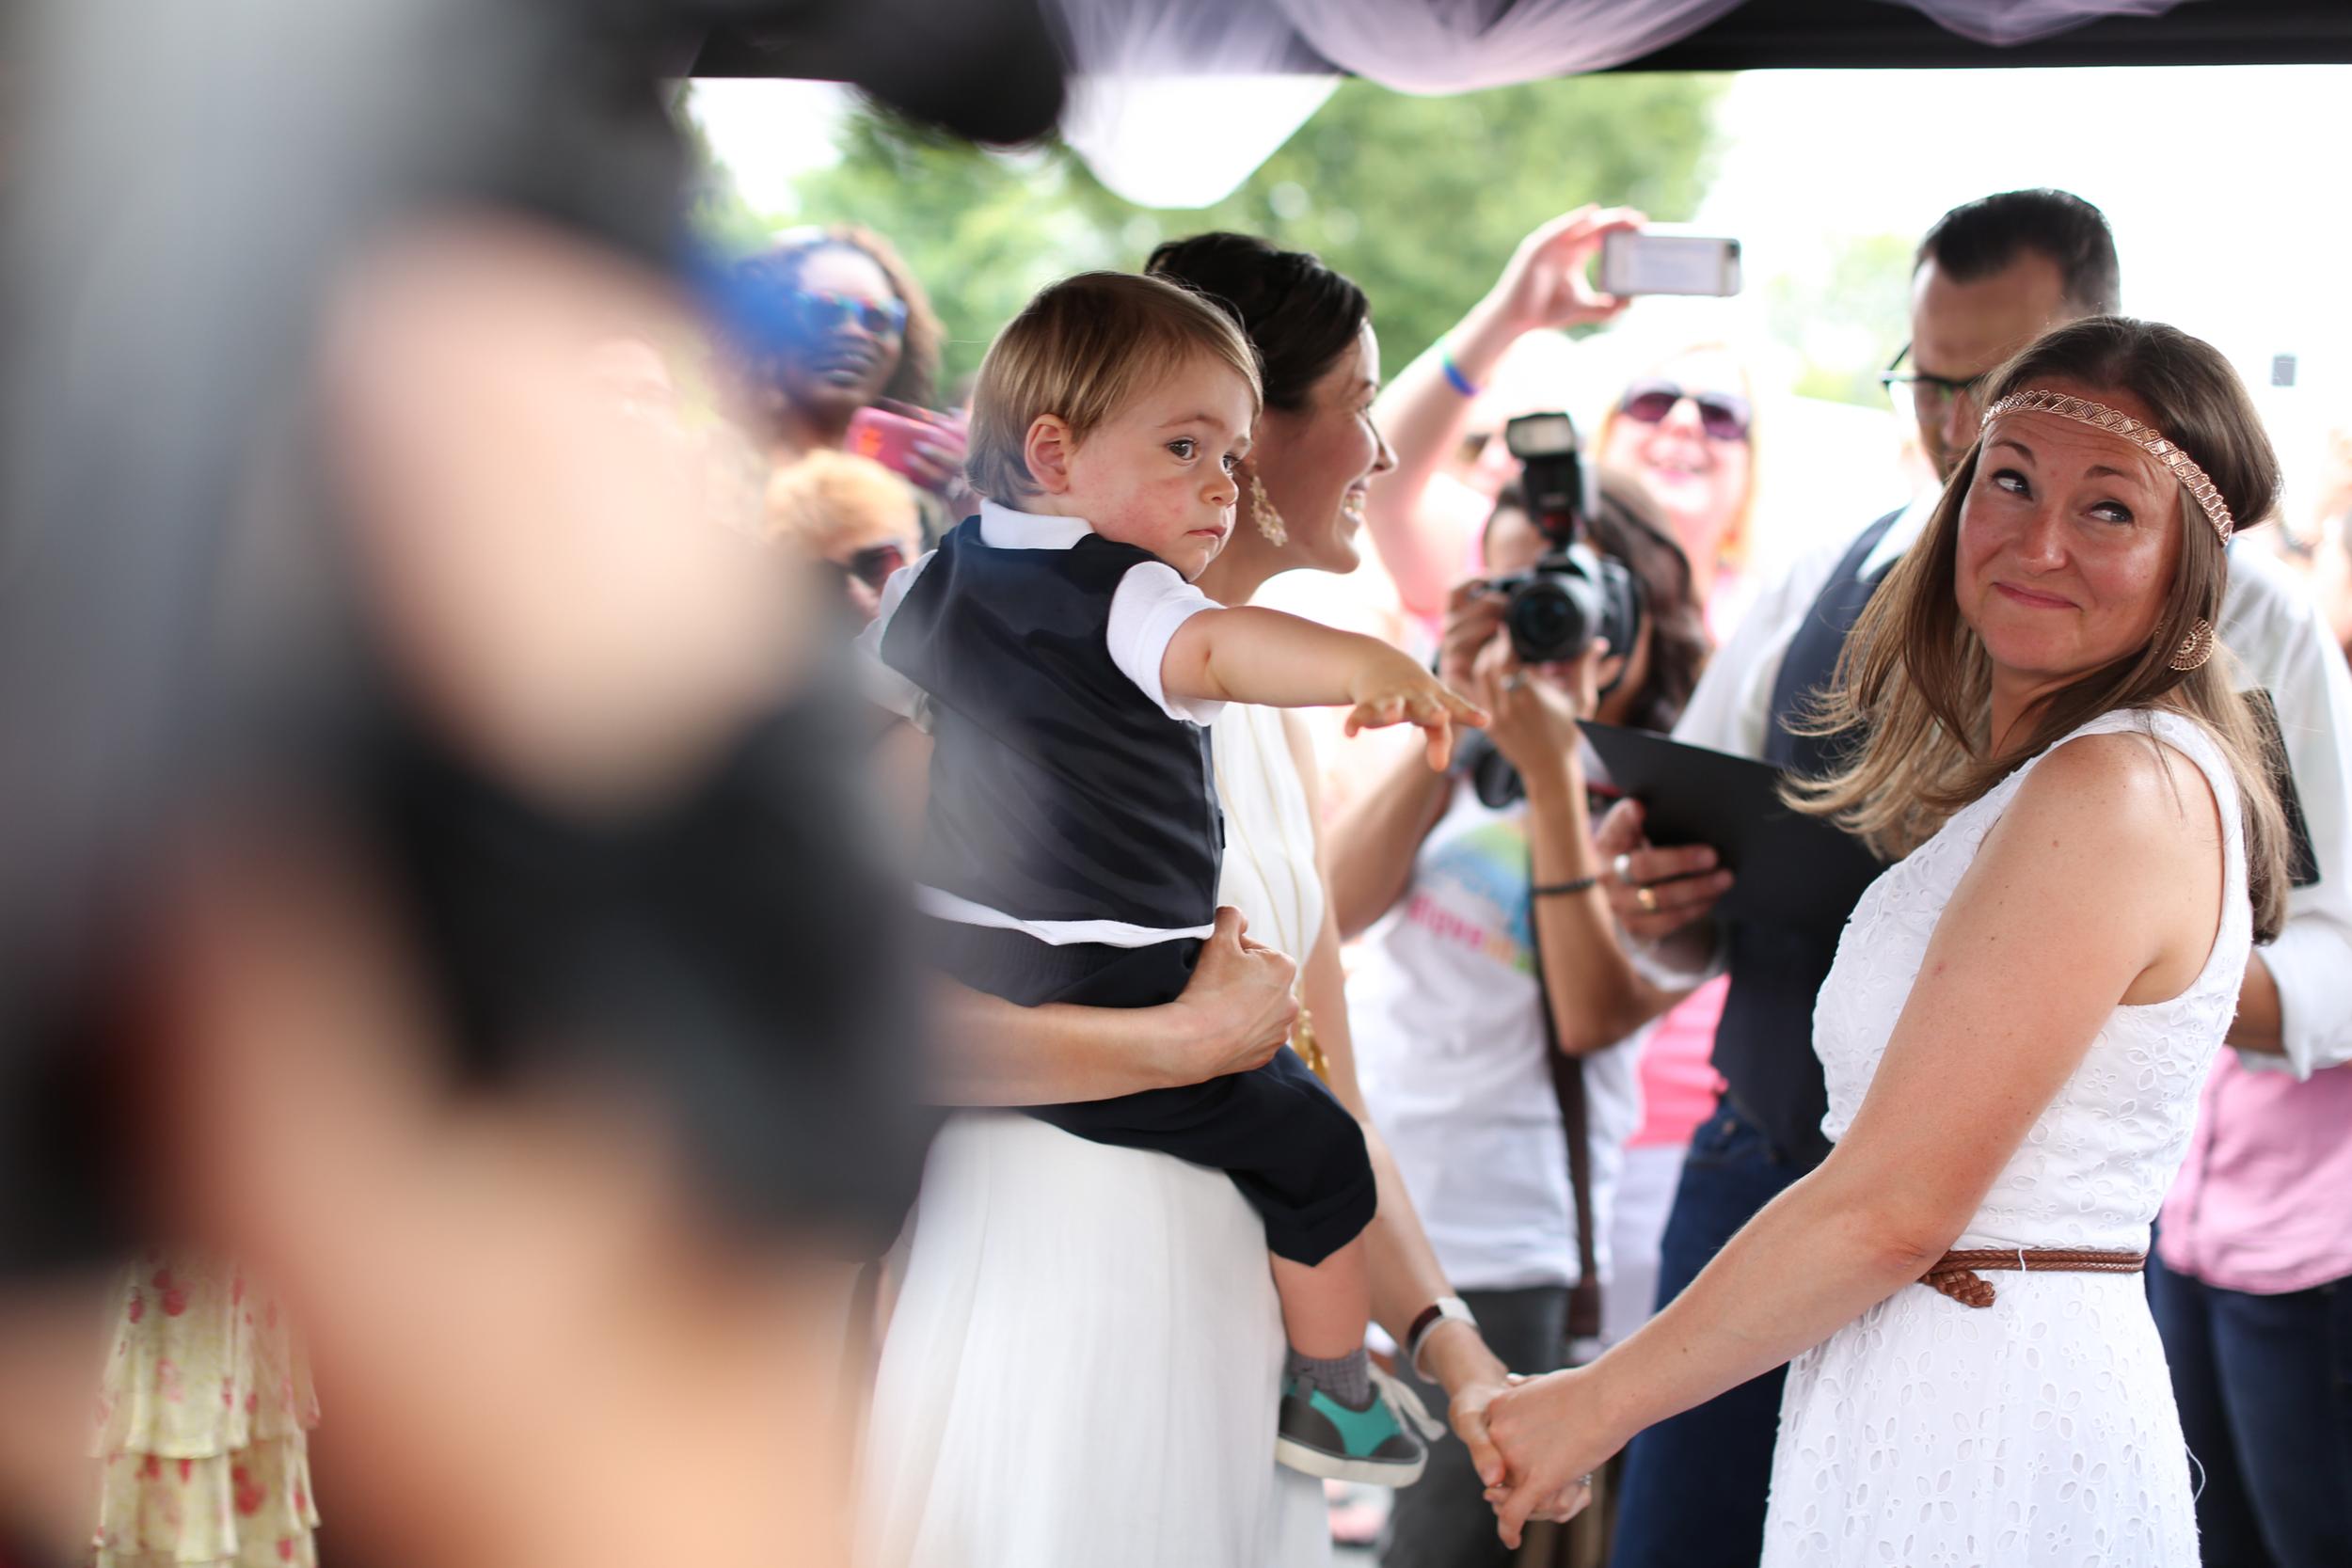 FEVA TAPROOM MARRIAGE CELBRATION SCOTUS RULING 2015 WEBSITE  (47 of 91).jpg